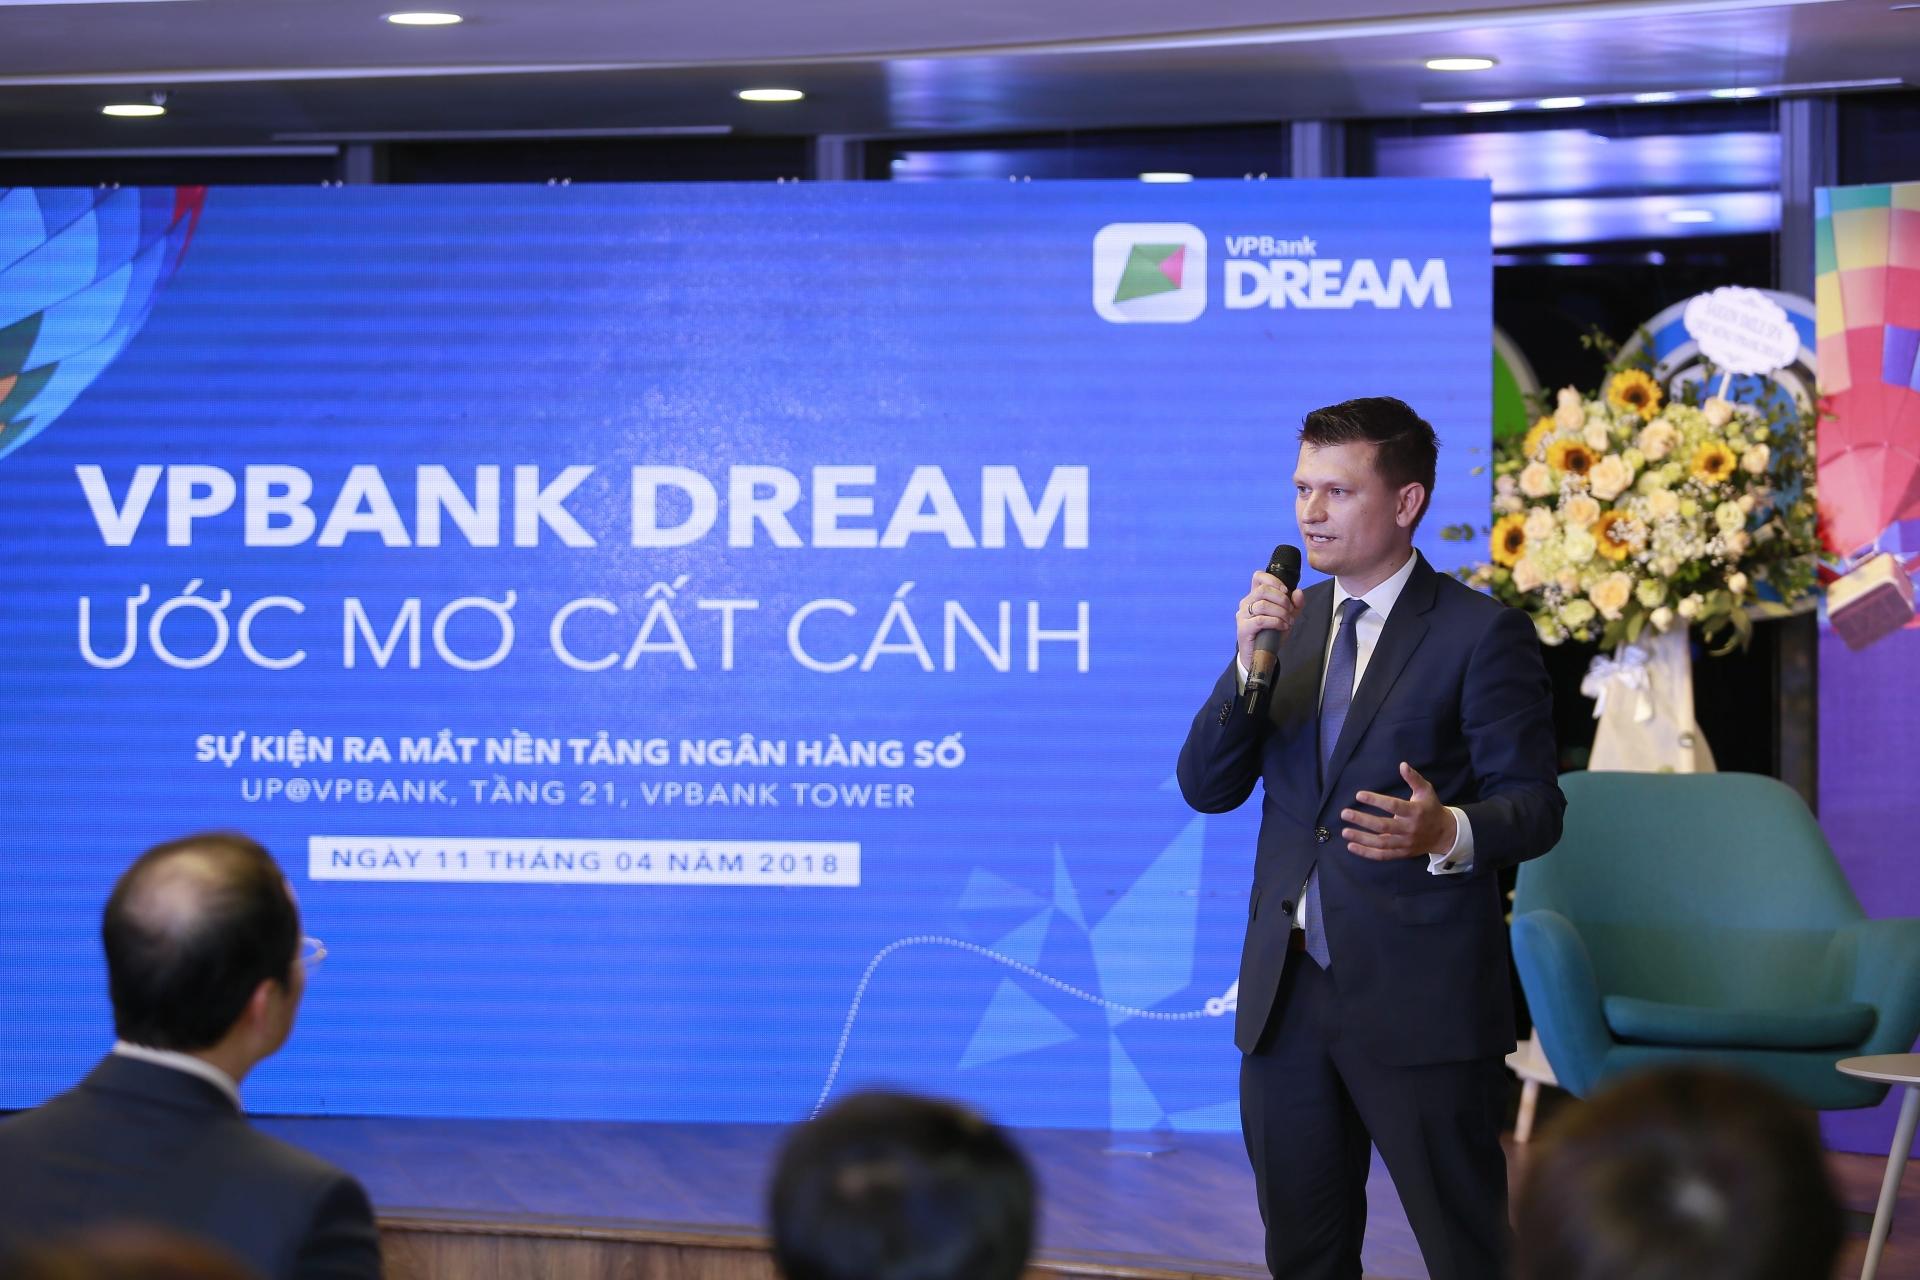 New VPBank app makes 'Dreams' come true